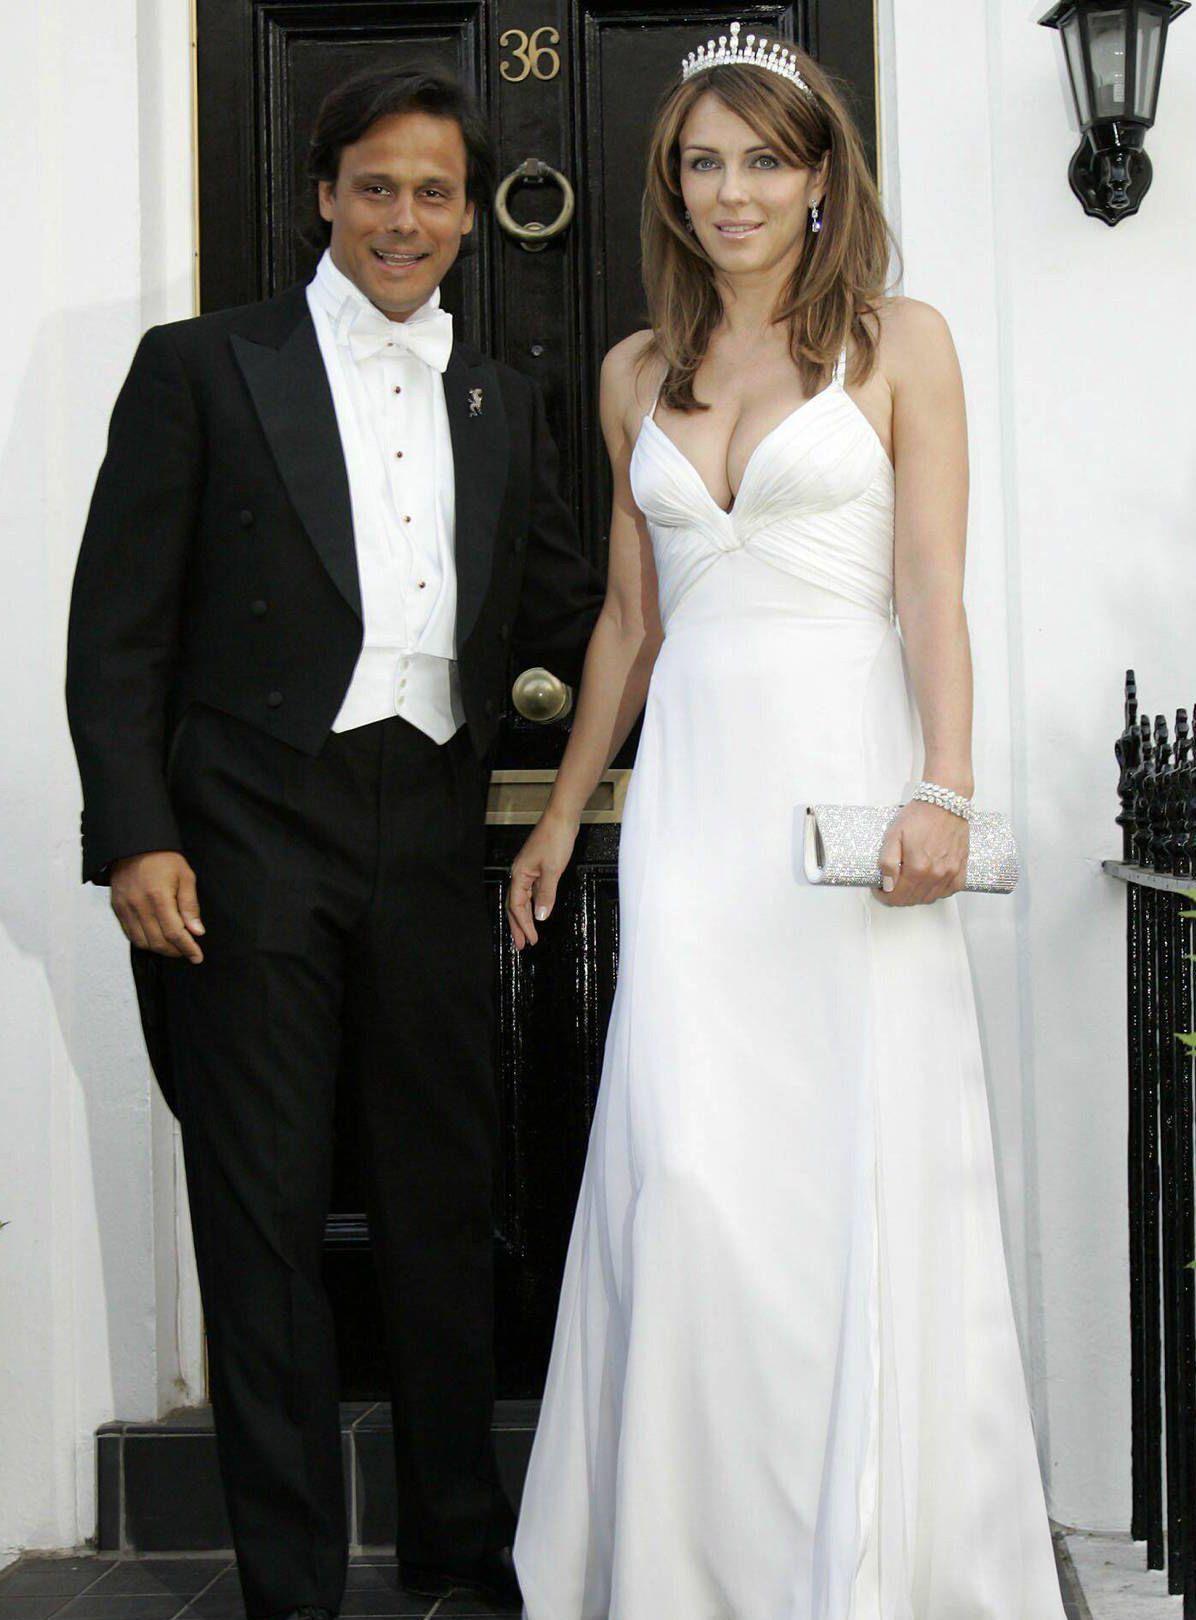 cba71c3a5506 KLARE FOR BRYLLUP  Liz Hurley og Arun Nayar skal gifte seg både i England  og India.